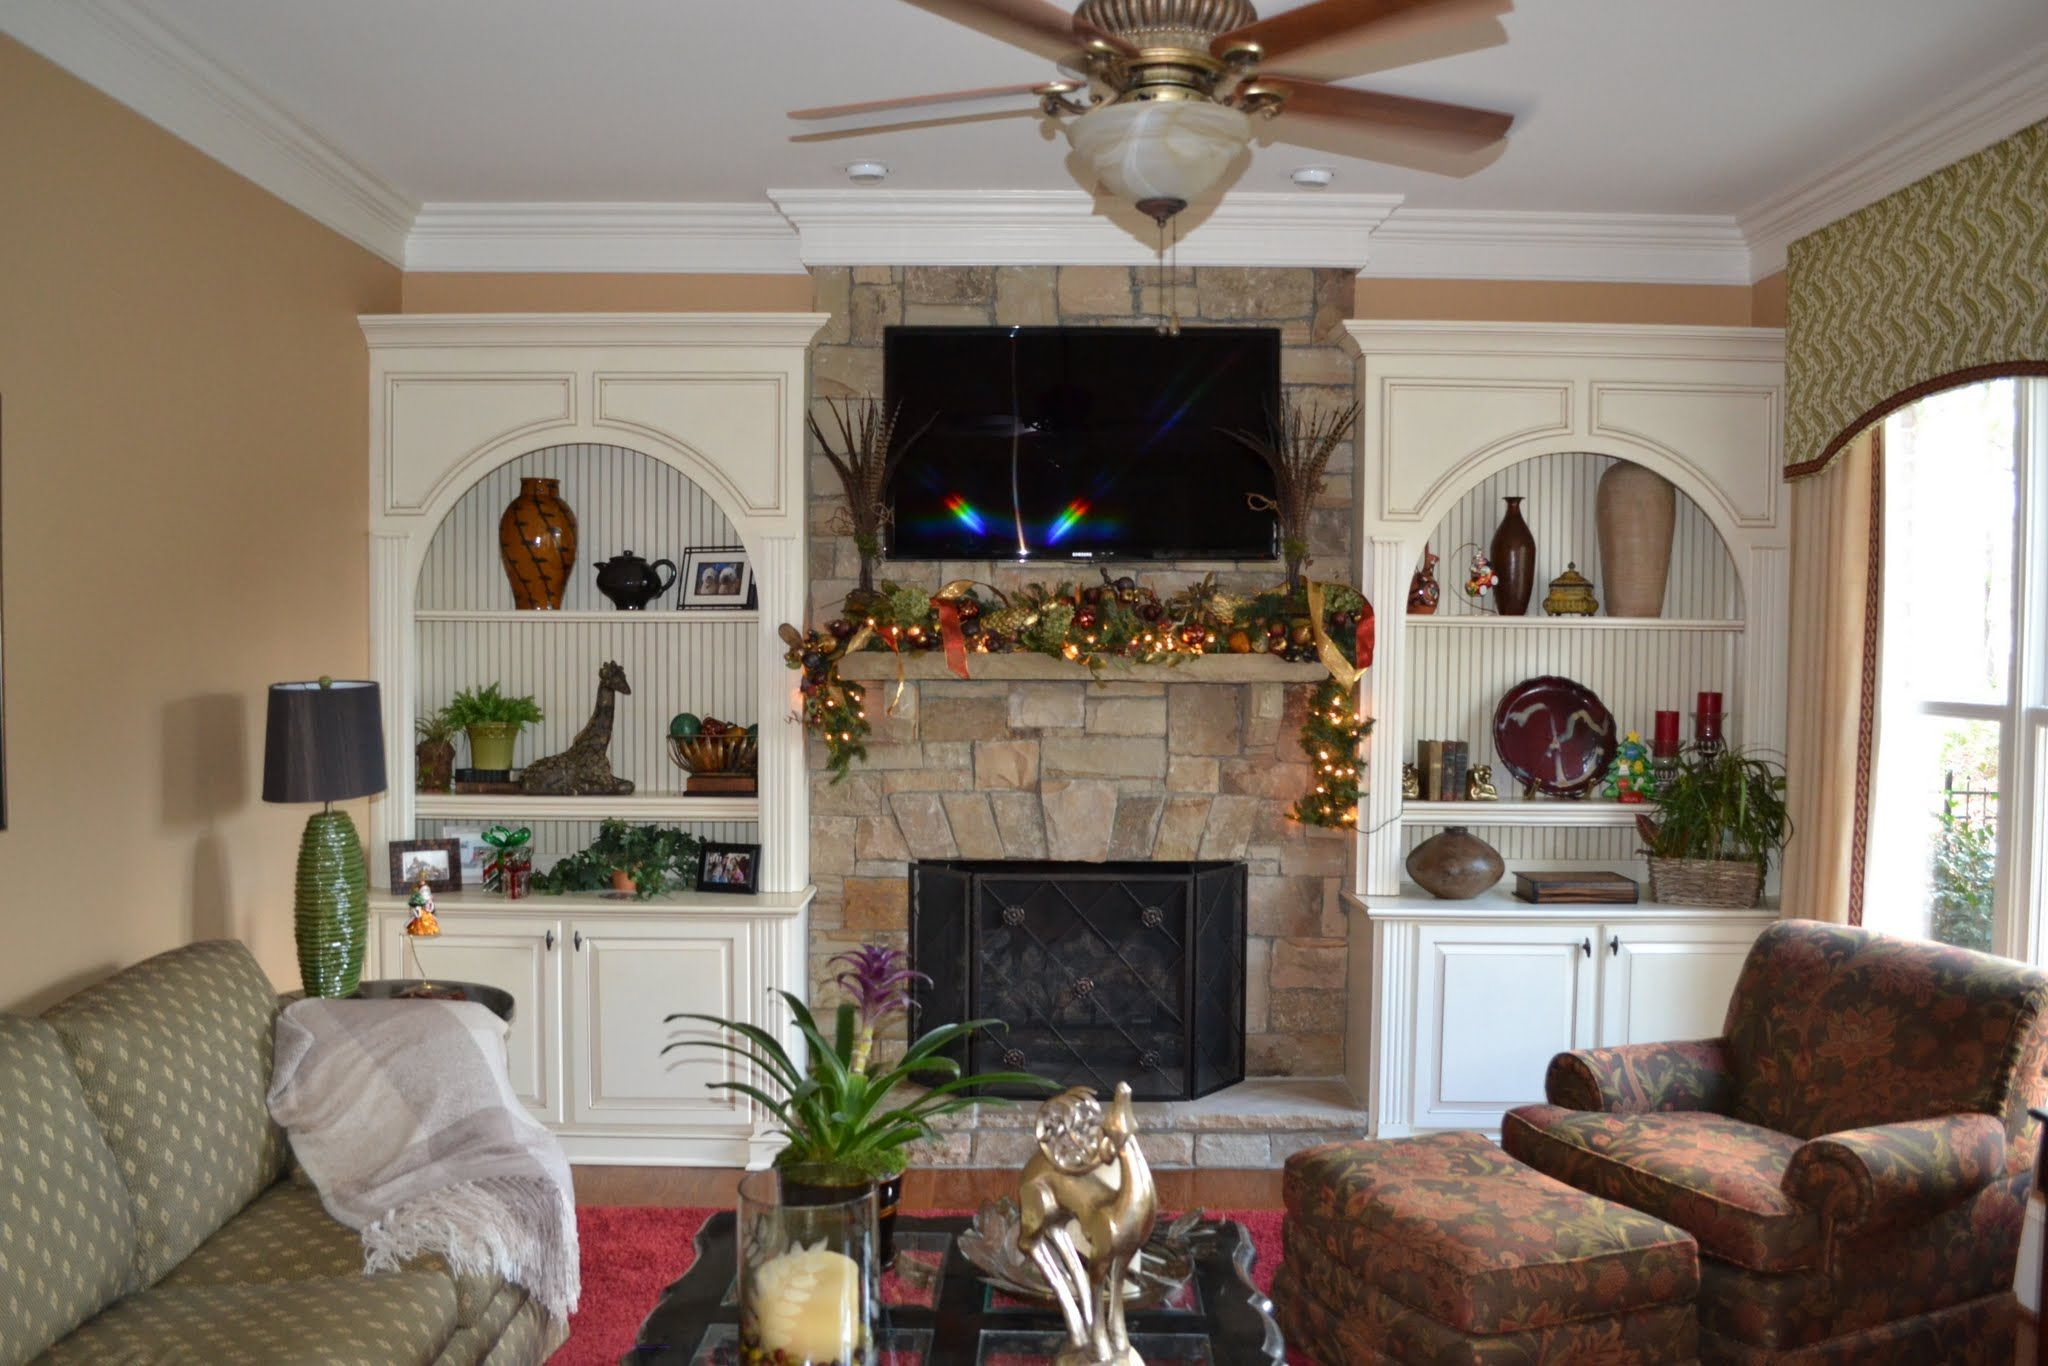 Interiors, Holidays, Interieur, Vacations, Holidays Events, Deco, Vacation